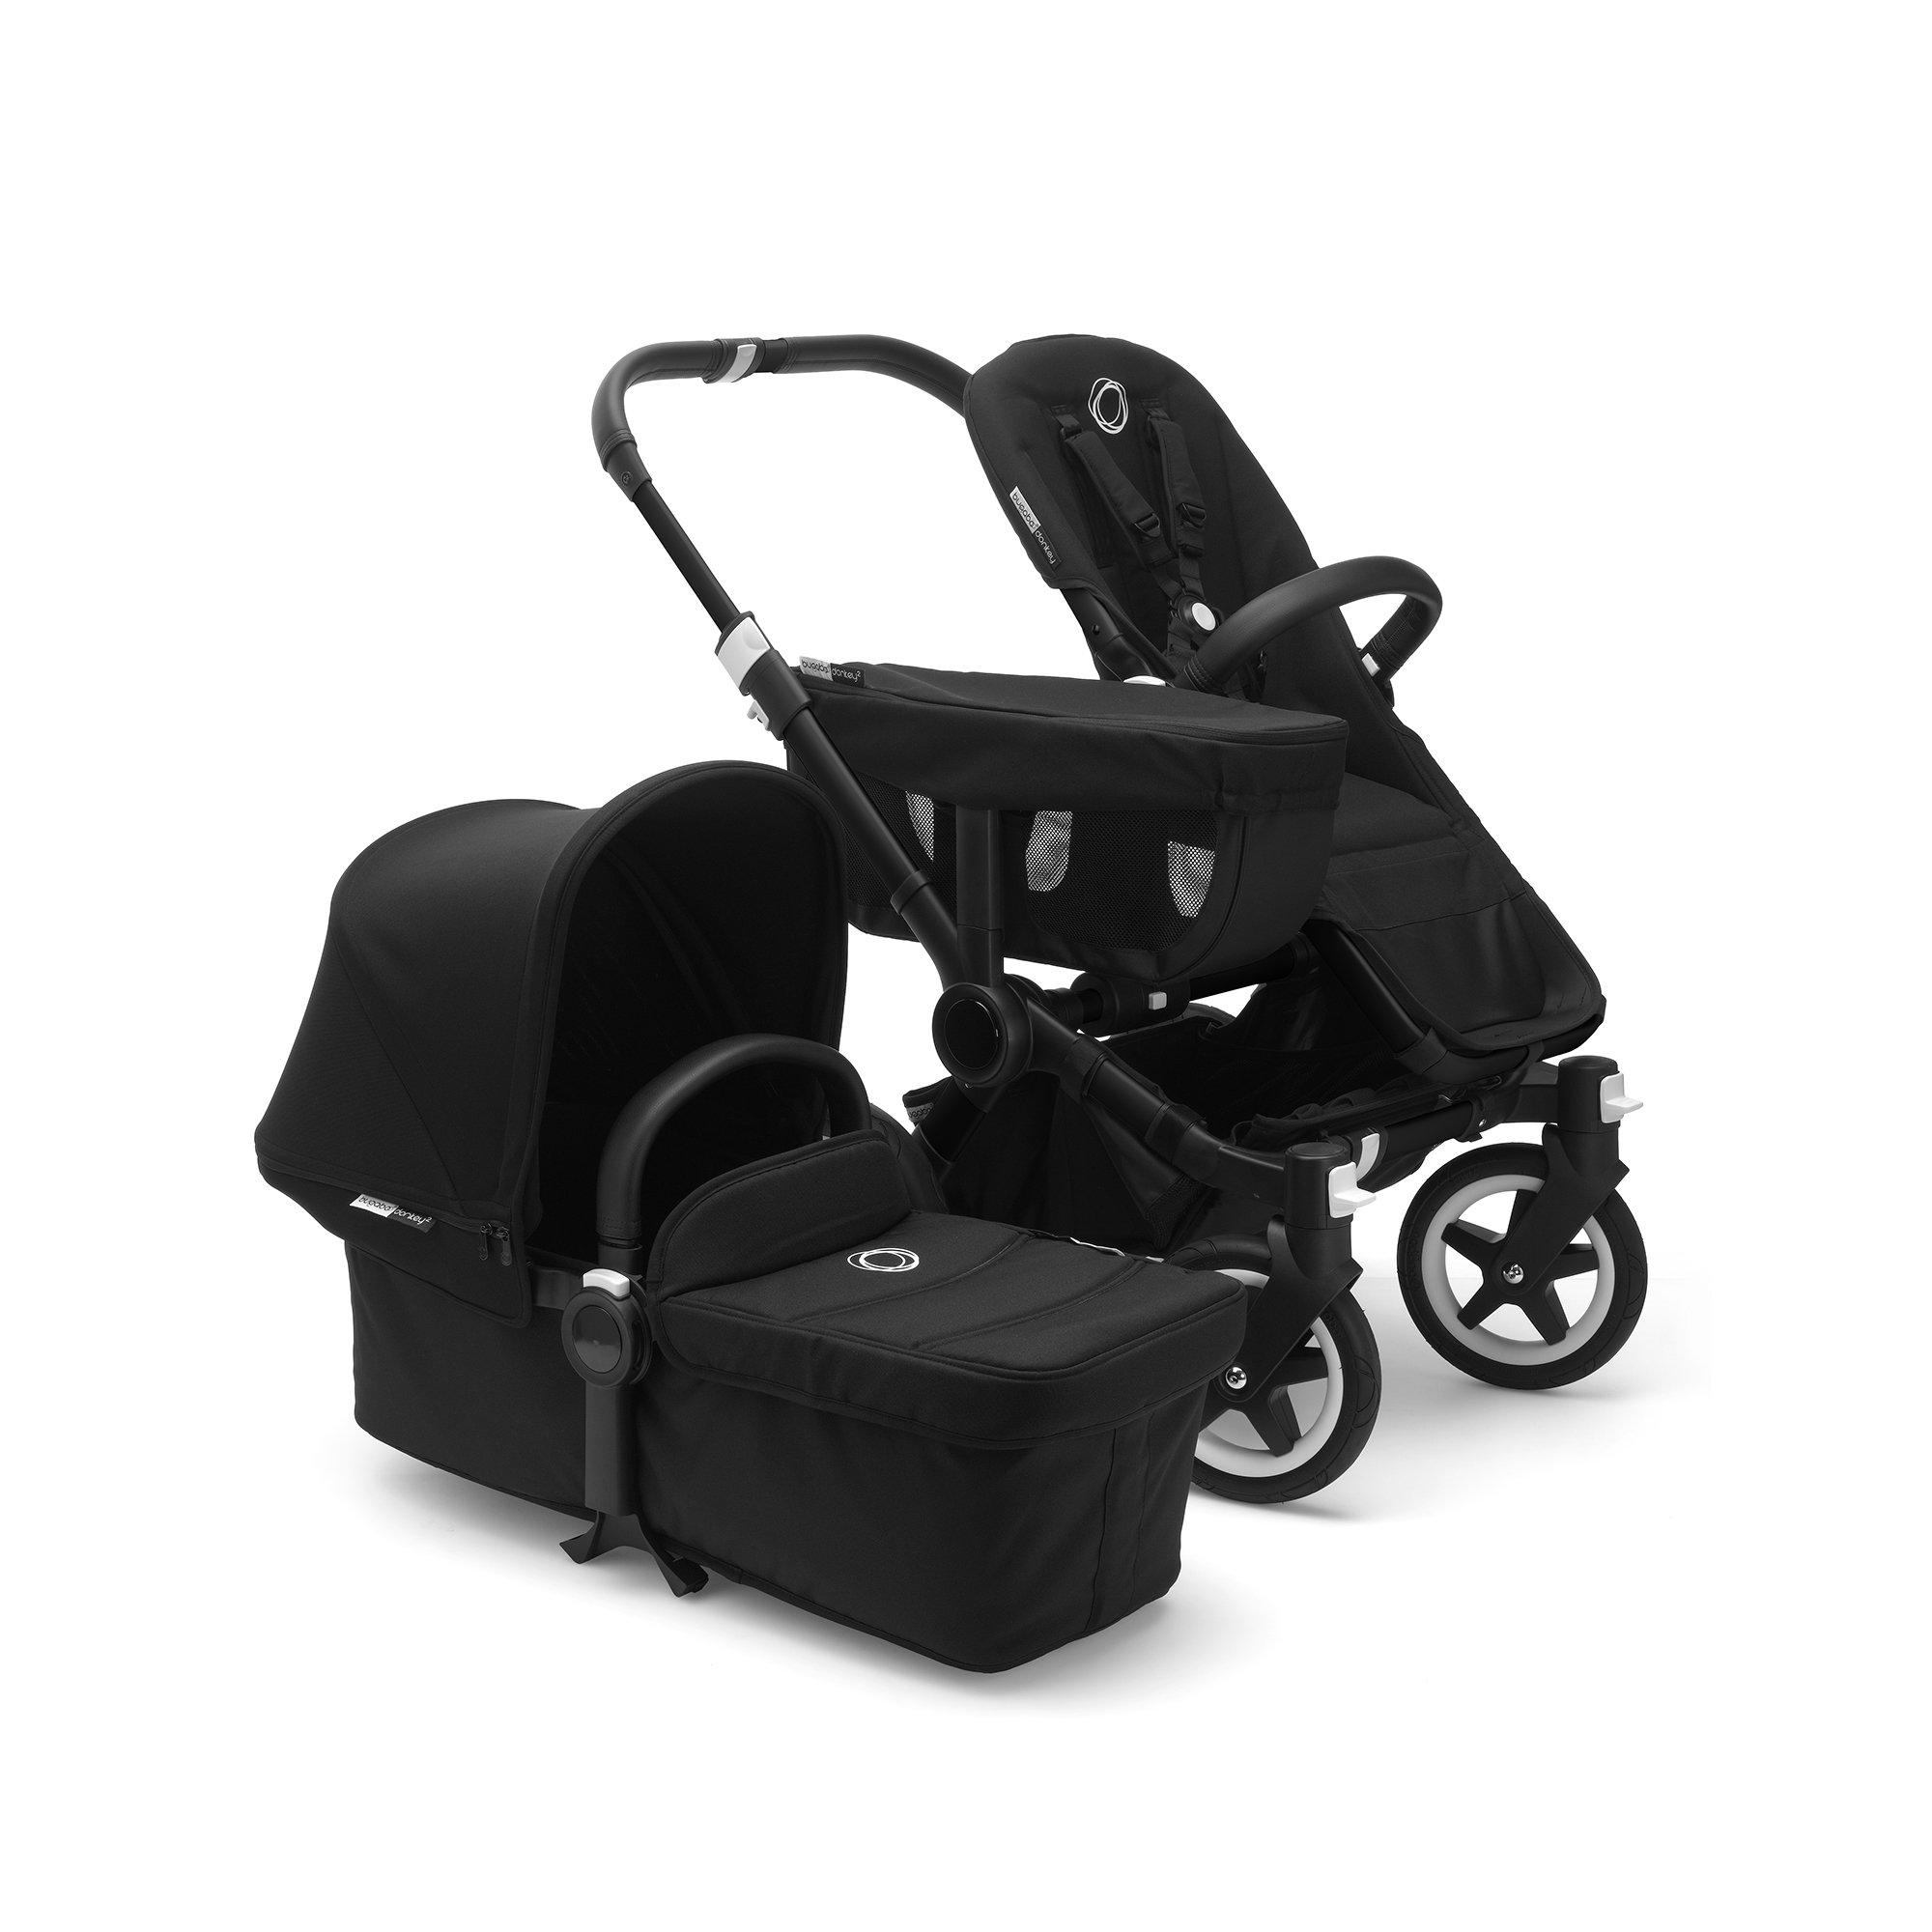 bugaboo donkey car seat adapter maxi cosi. Black Bedroom Furniture Sets. Home Design Ideas